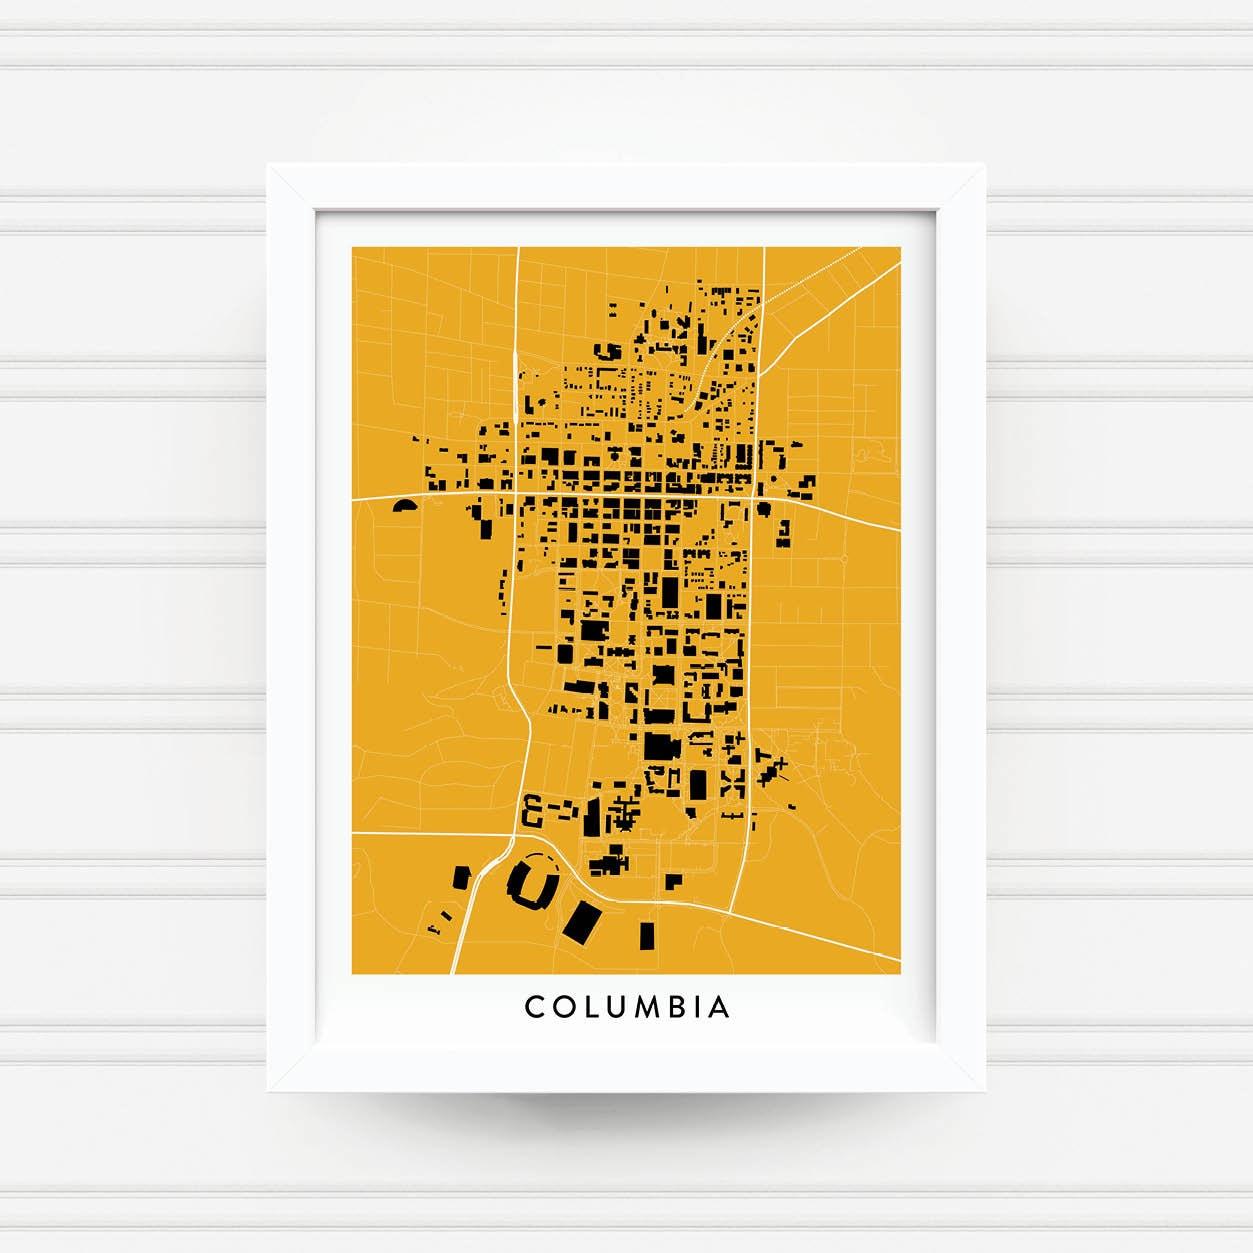 COLUMBIA MISSOURI Map Print Home Decor Office Decor